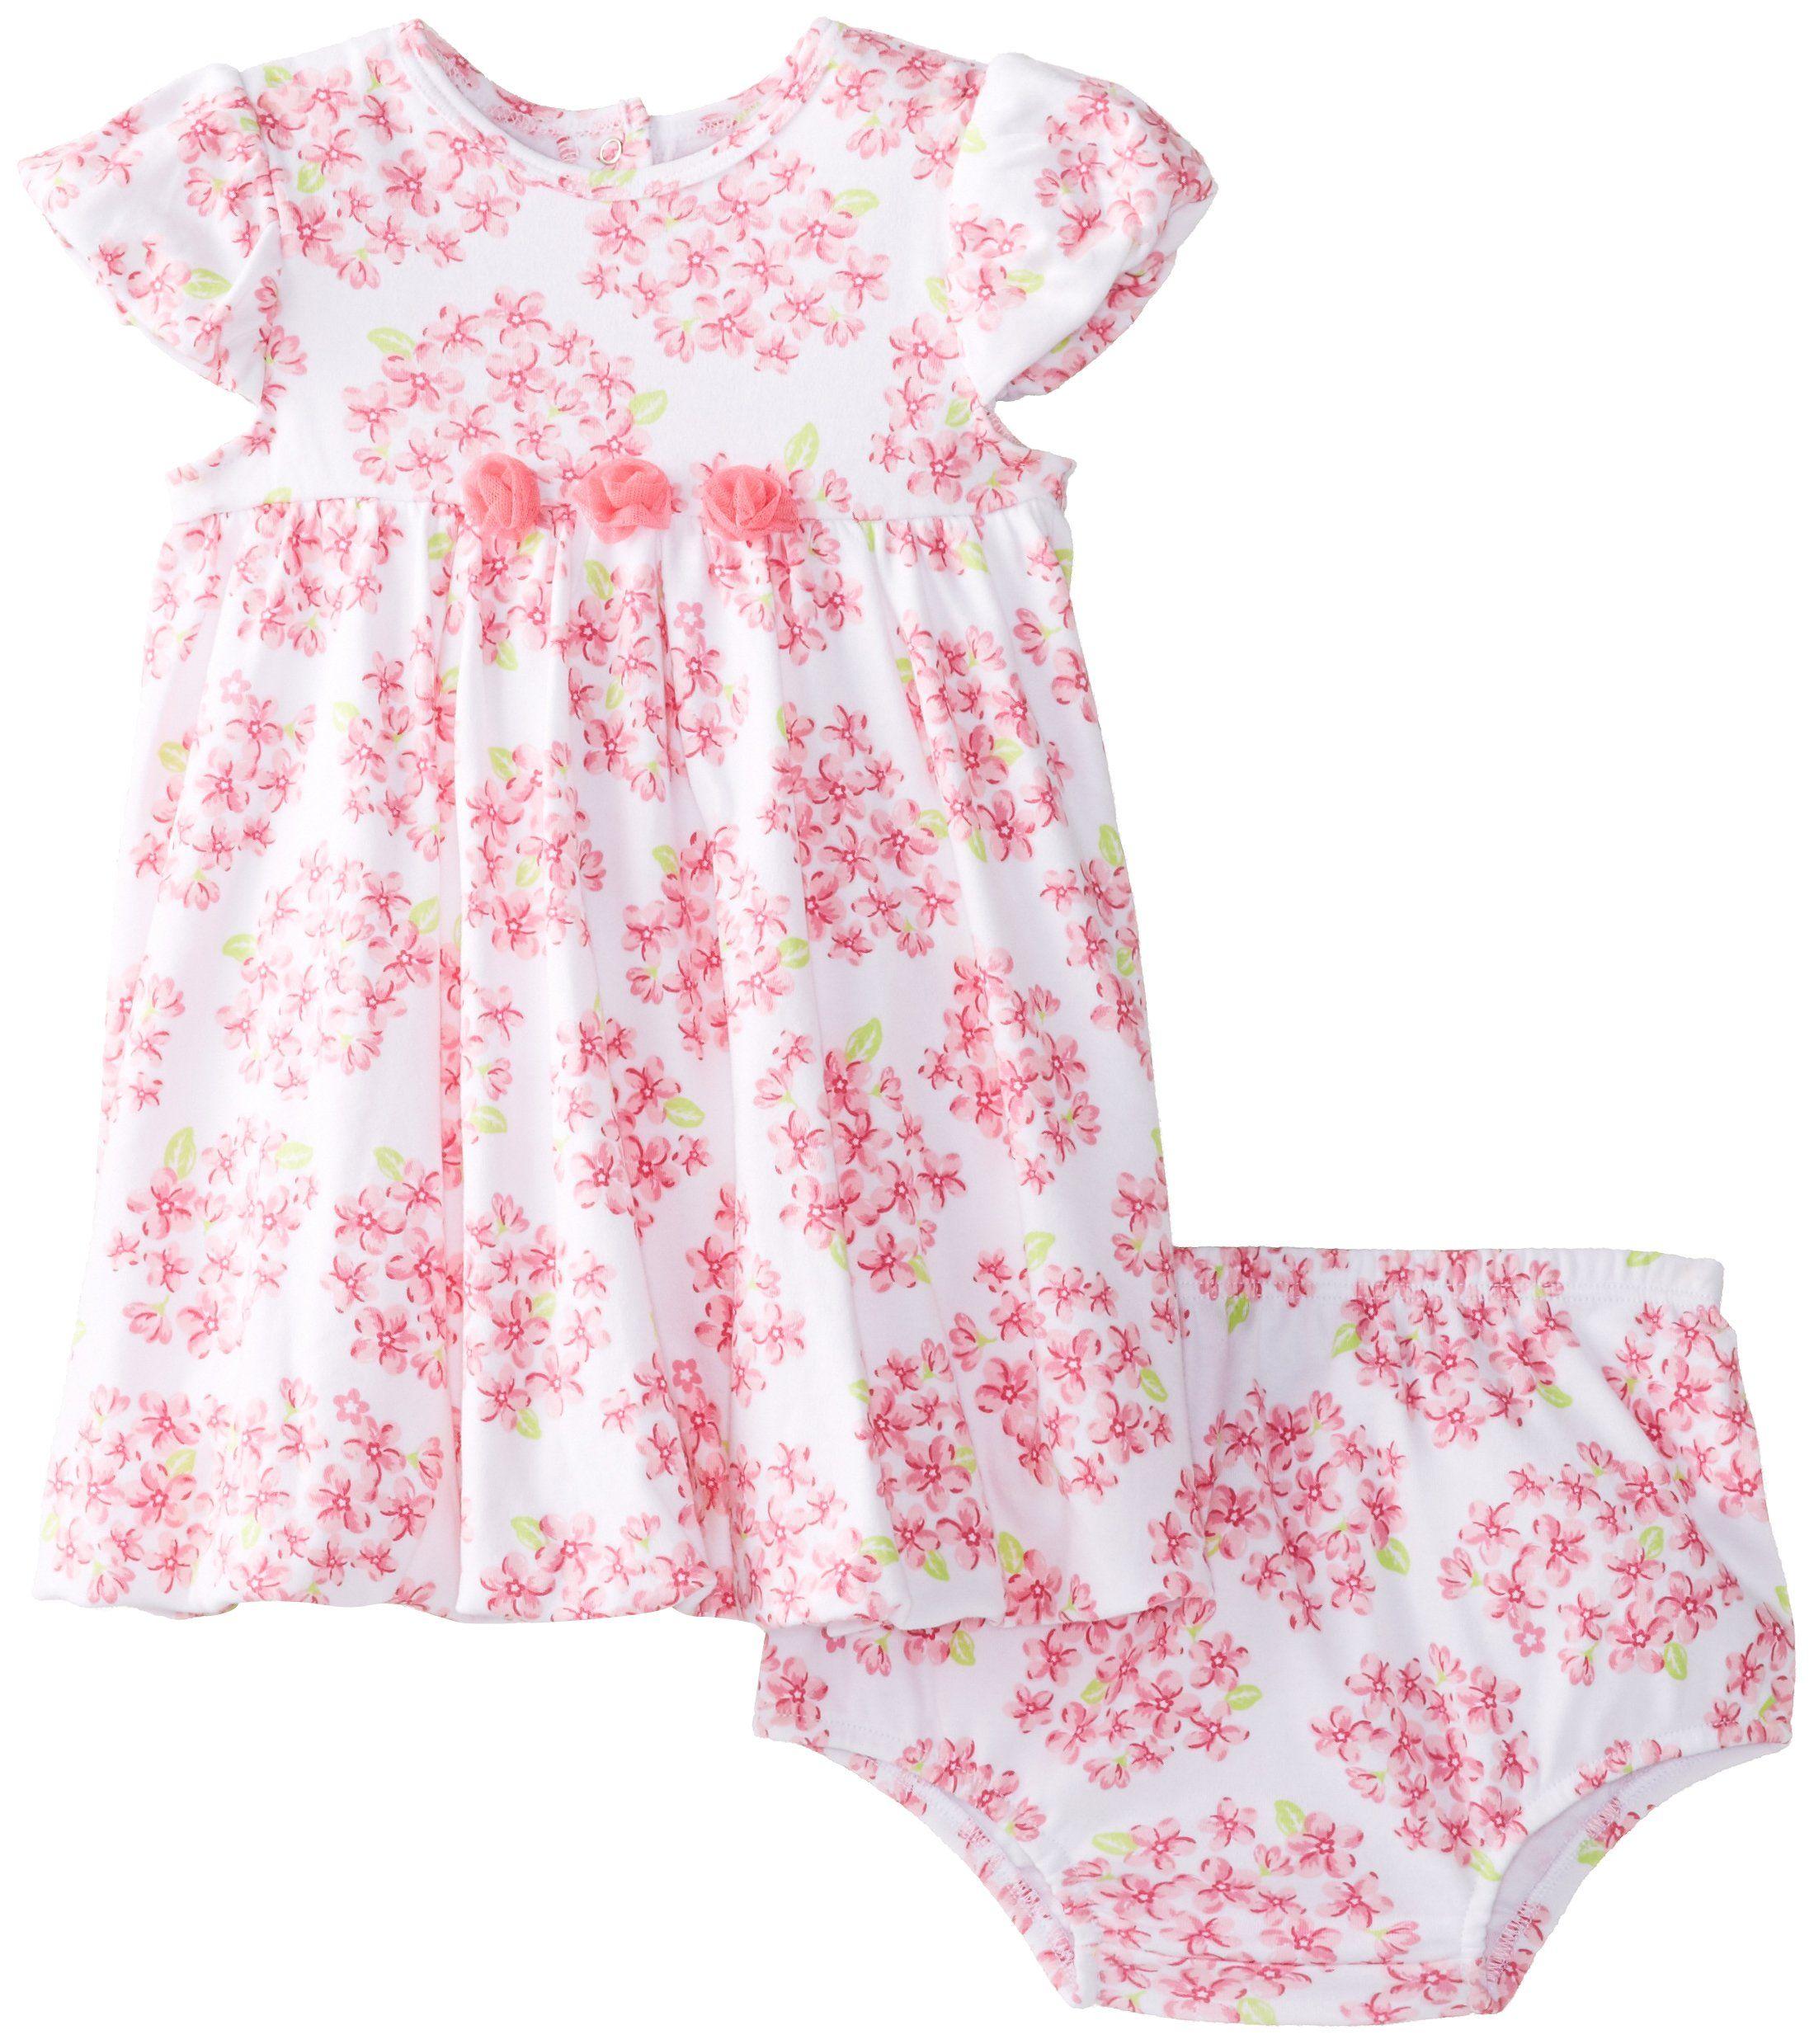 Little Me Baby-Girls Newborn Floral Bunch Dress Set, White Floral, 6 Months